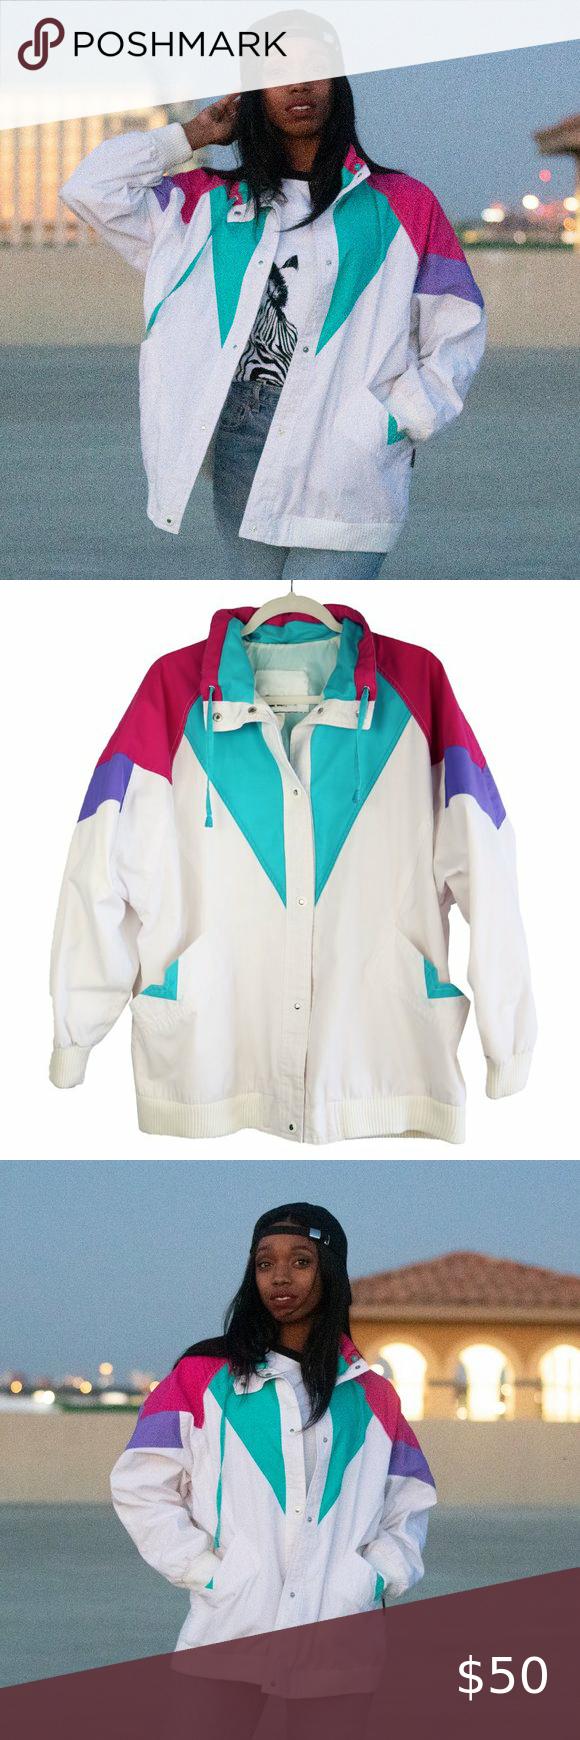 Vintage Izzi 80 S 90 S Multicolored Jacket Large Vintage Coat Jackets True Vintage [ 1740 x 580 Pixel ]